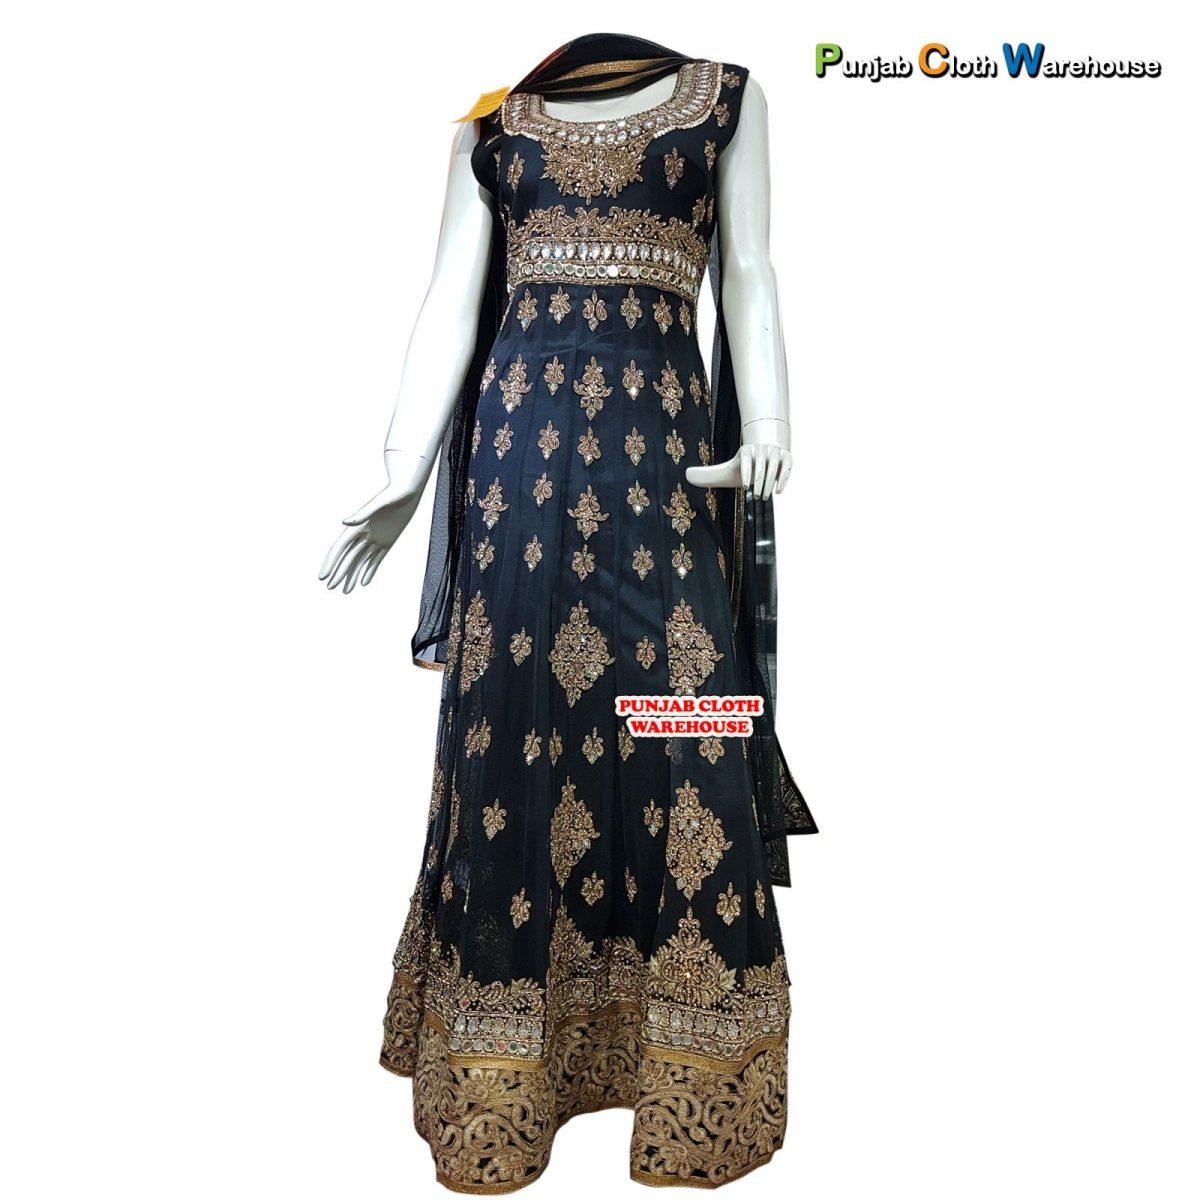 Designer Party Wear Suits, Sarees, Lehengas & Sherwanis (16)